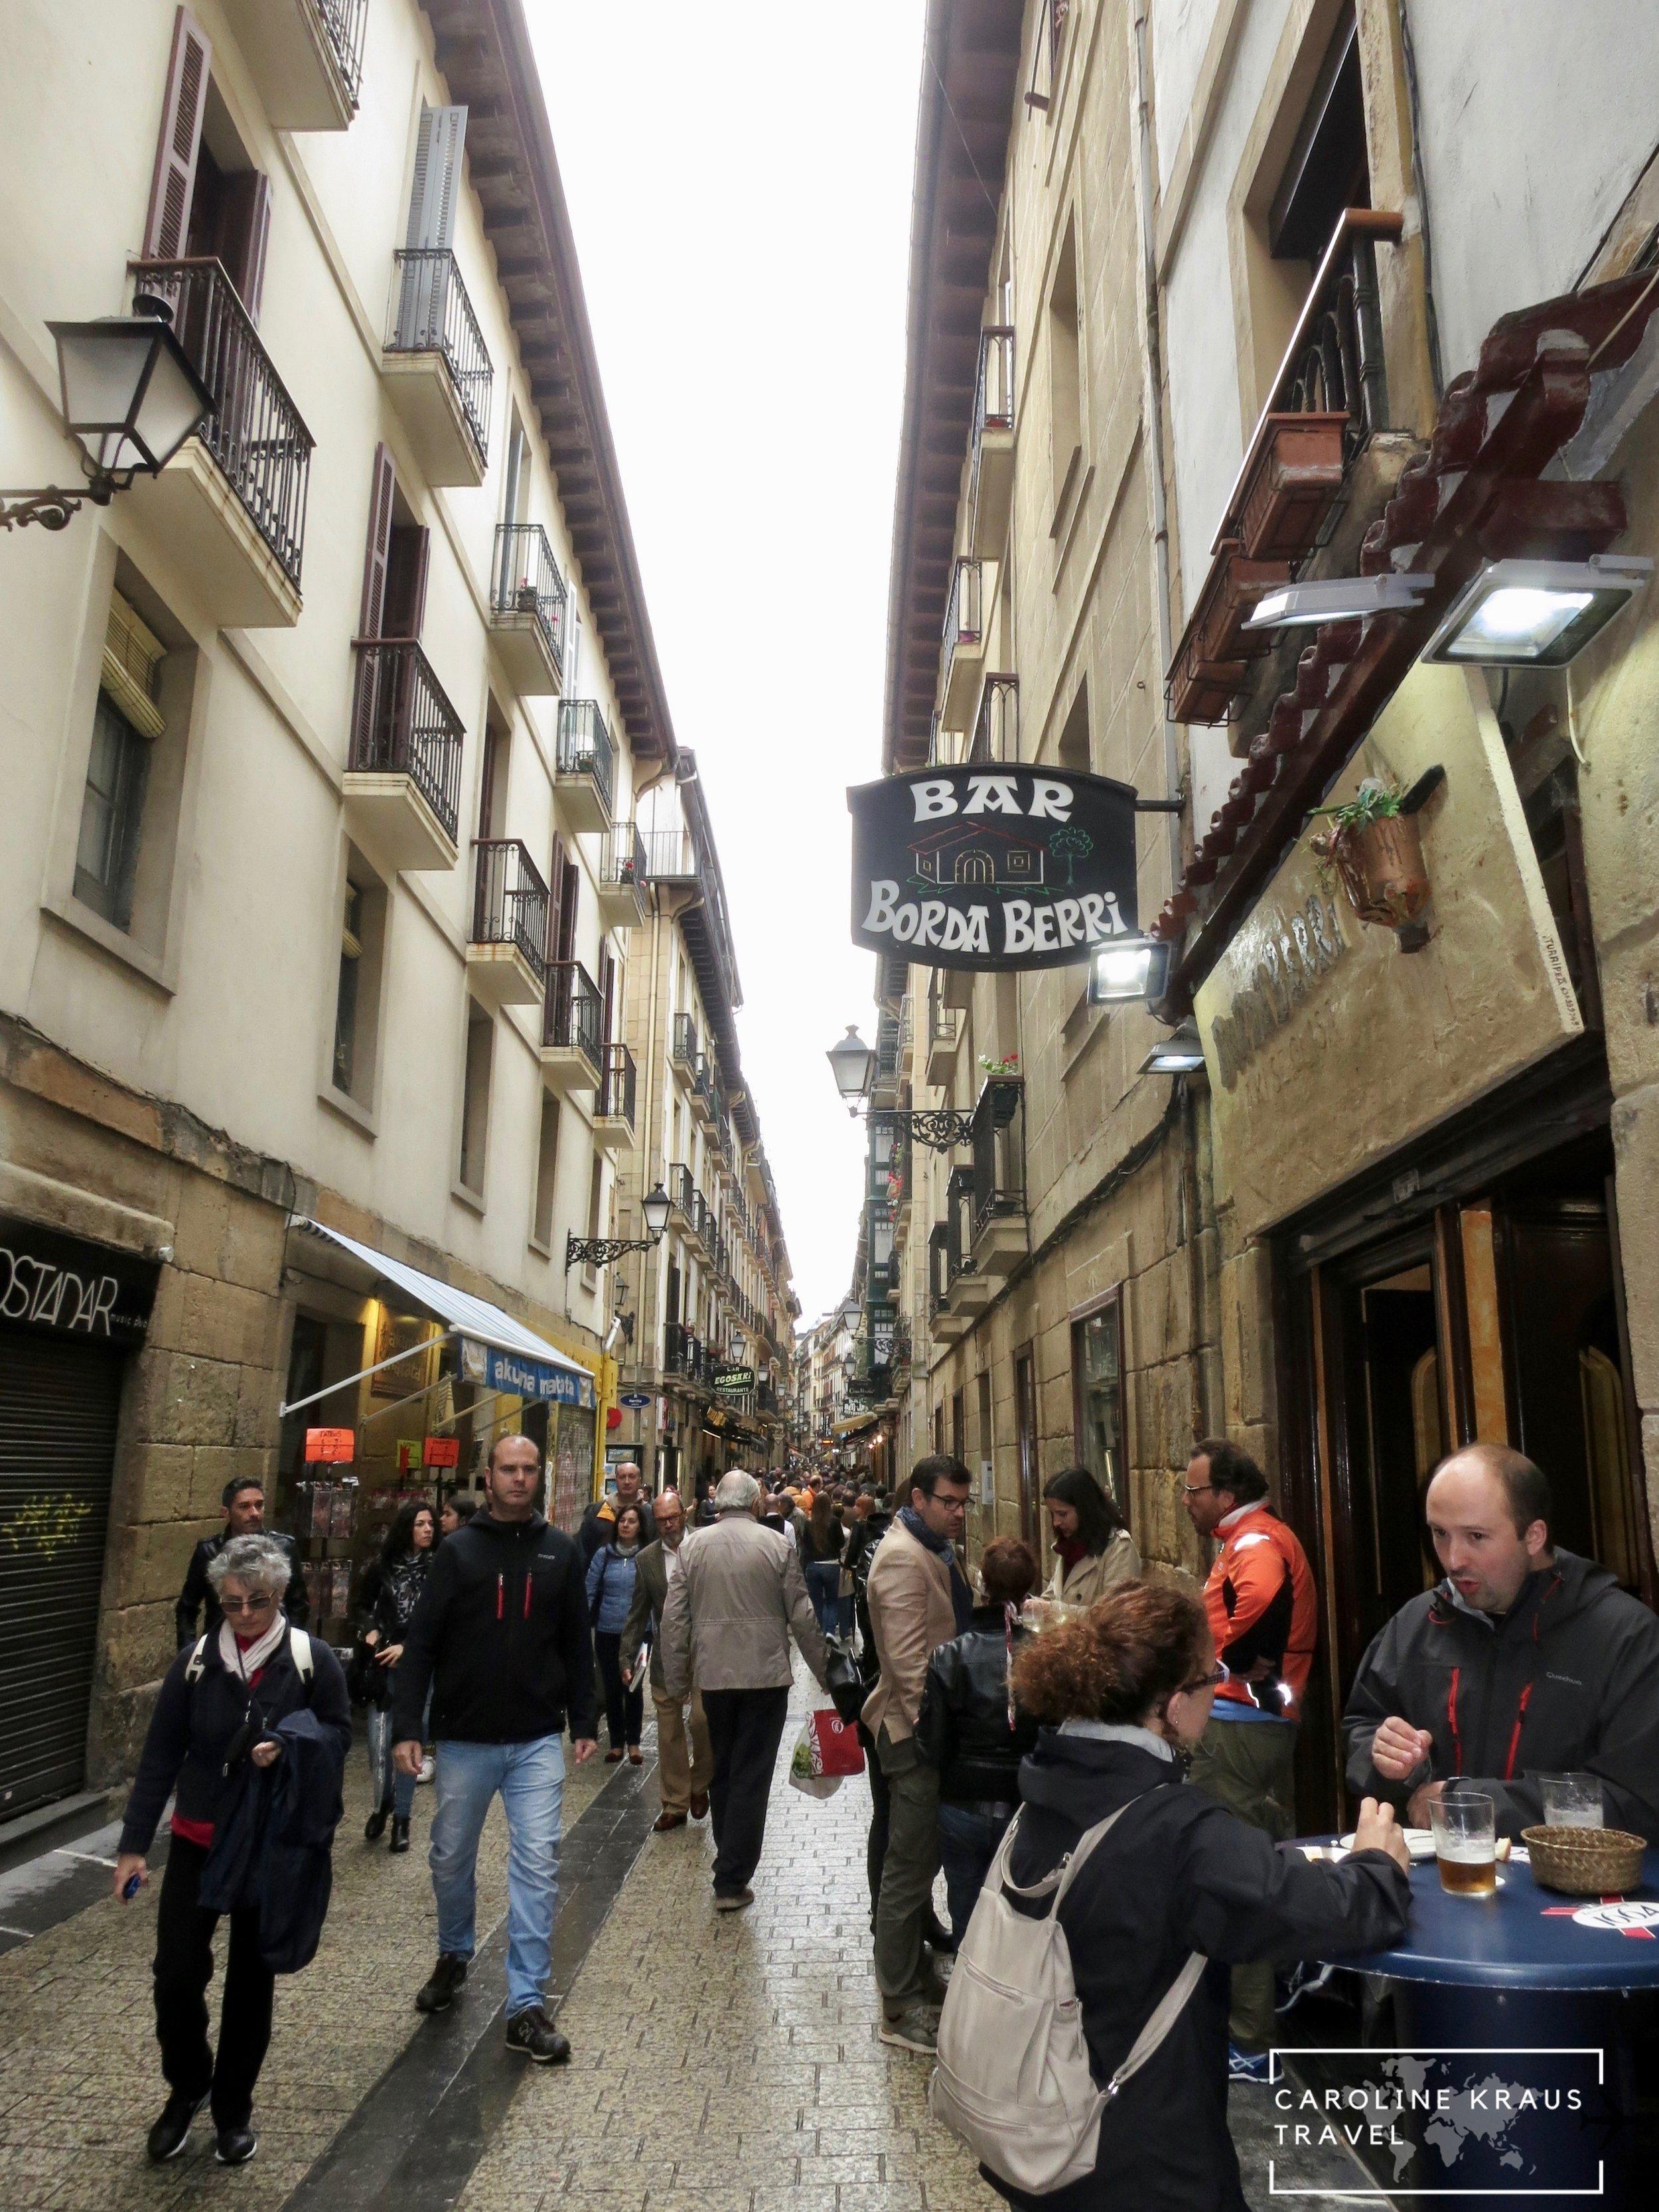 Pintxos bars on the streets of San Sebastian, Spain